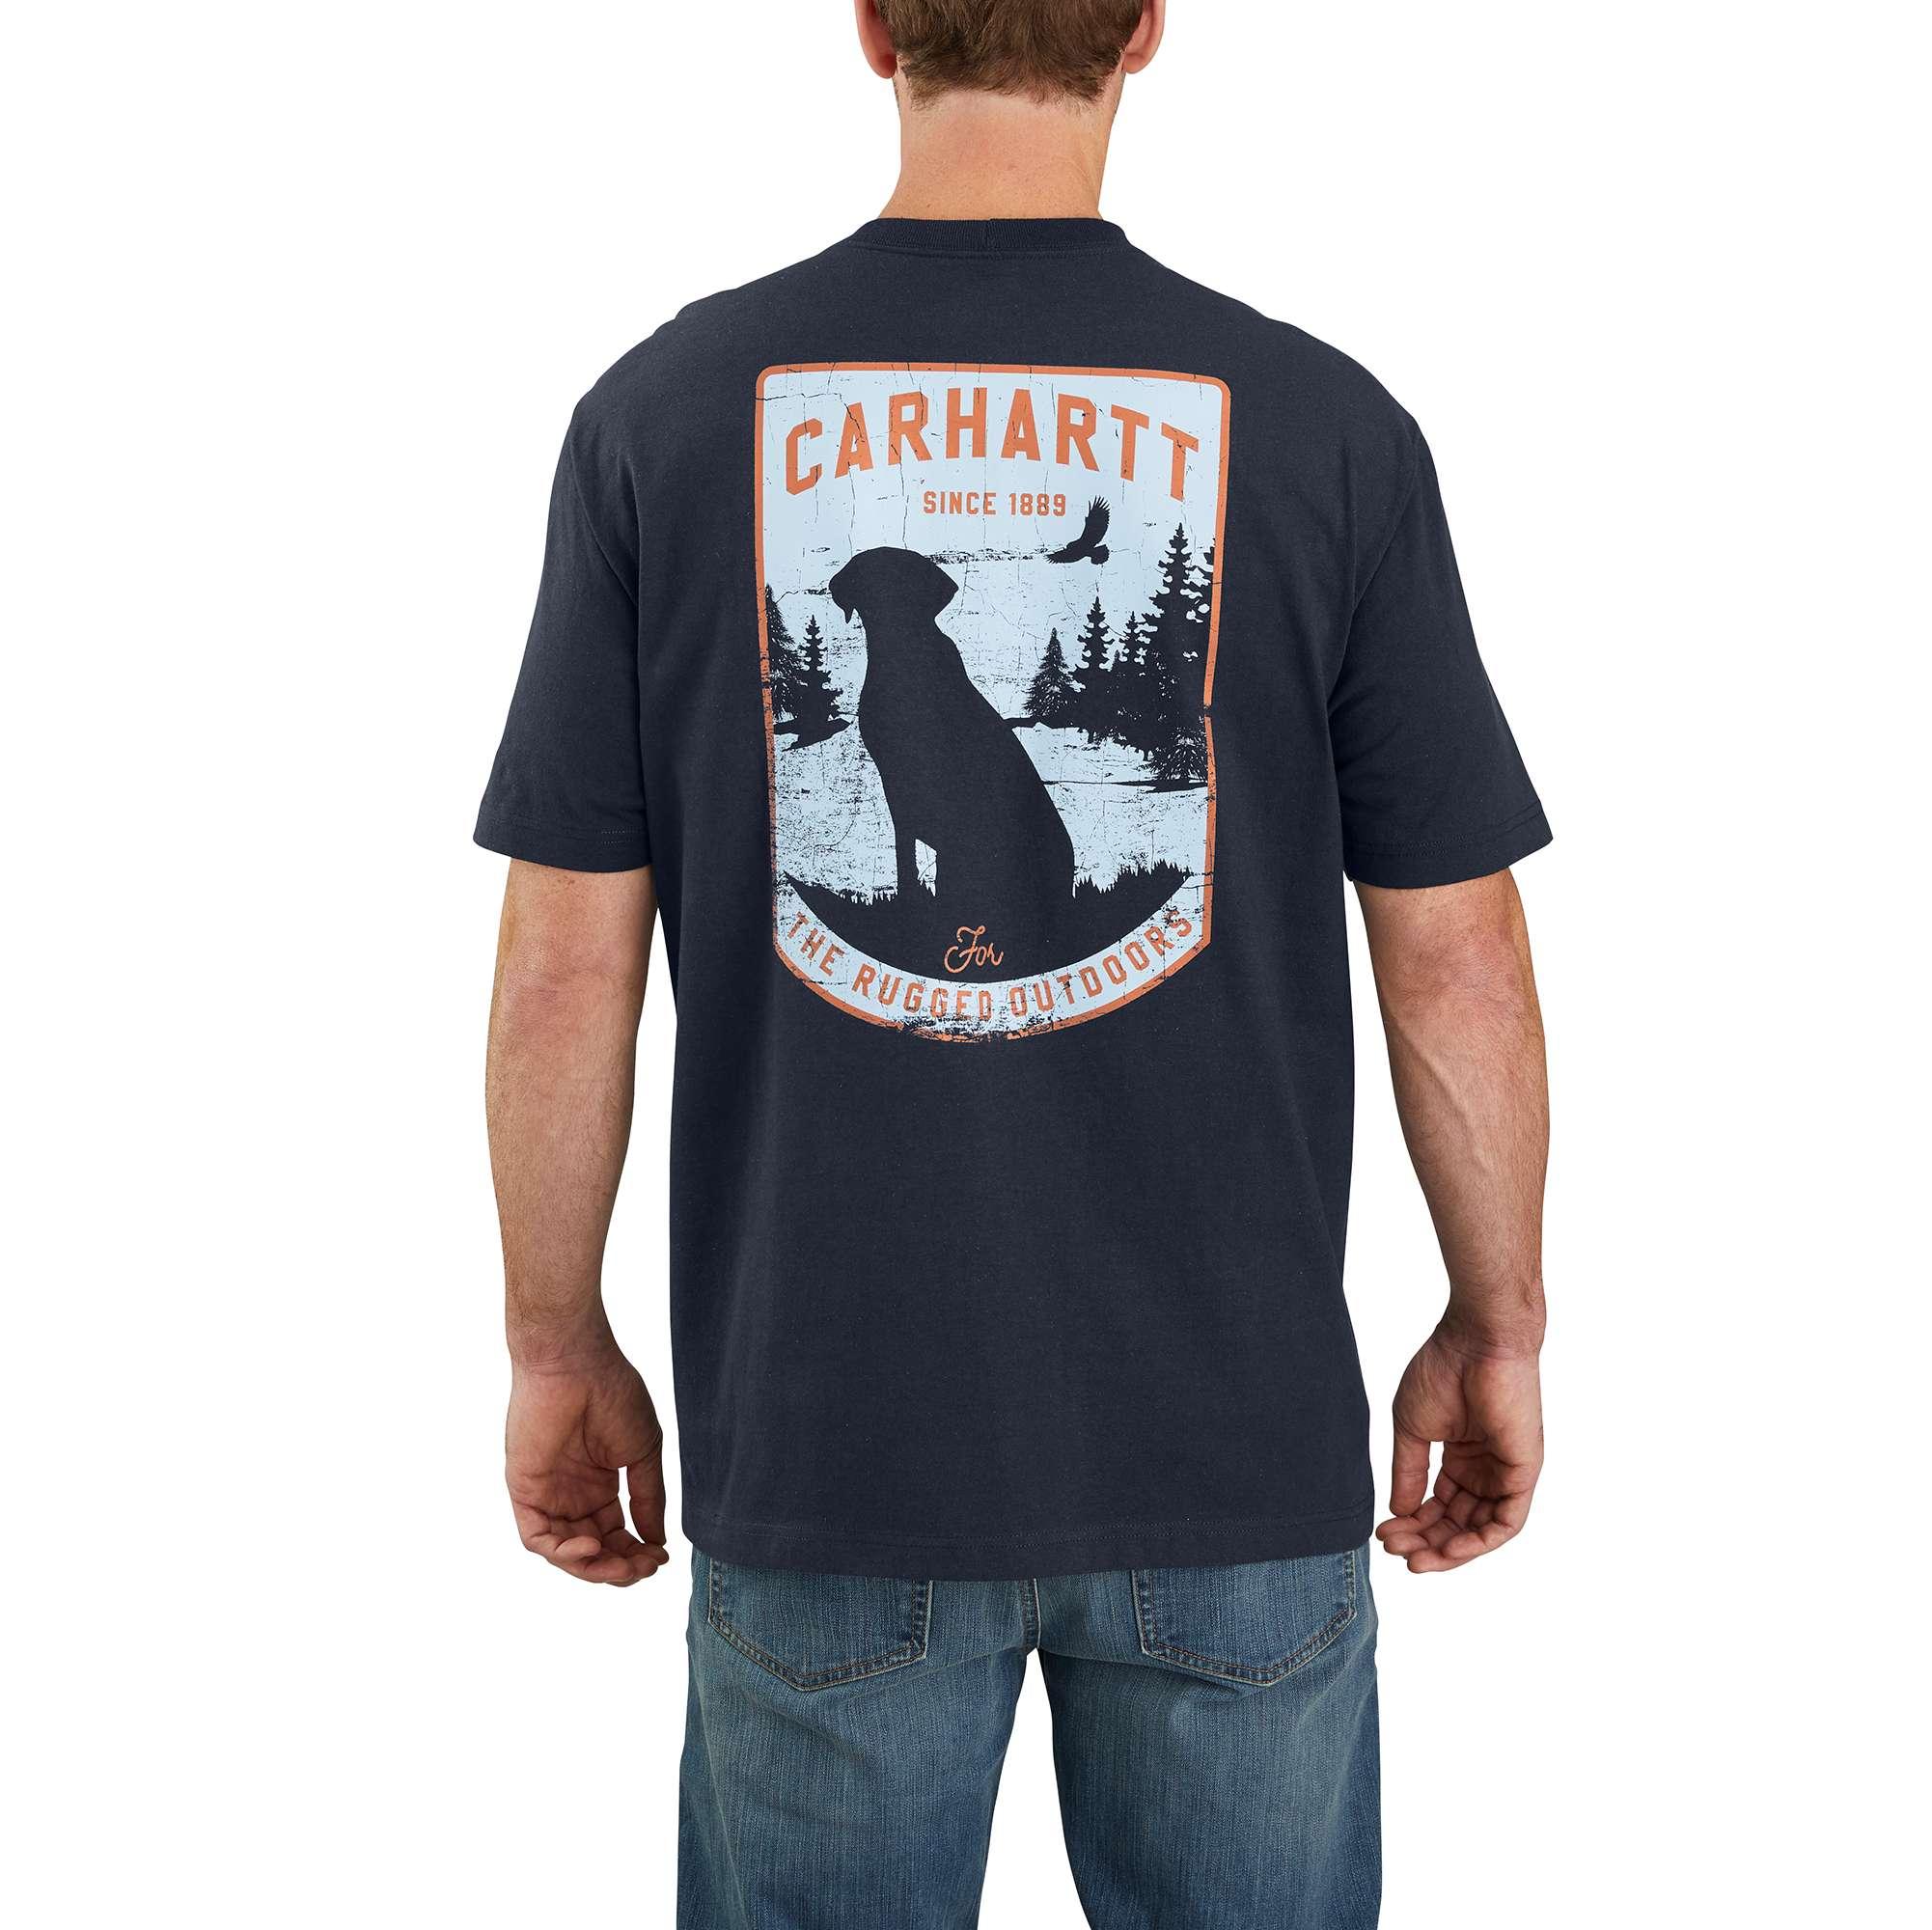 Carhartt Original Fit Heavyweight Short-Sleeve Pocket Dog Graphic T-Shirt